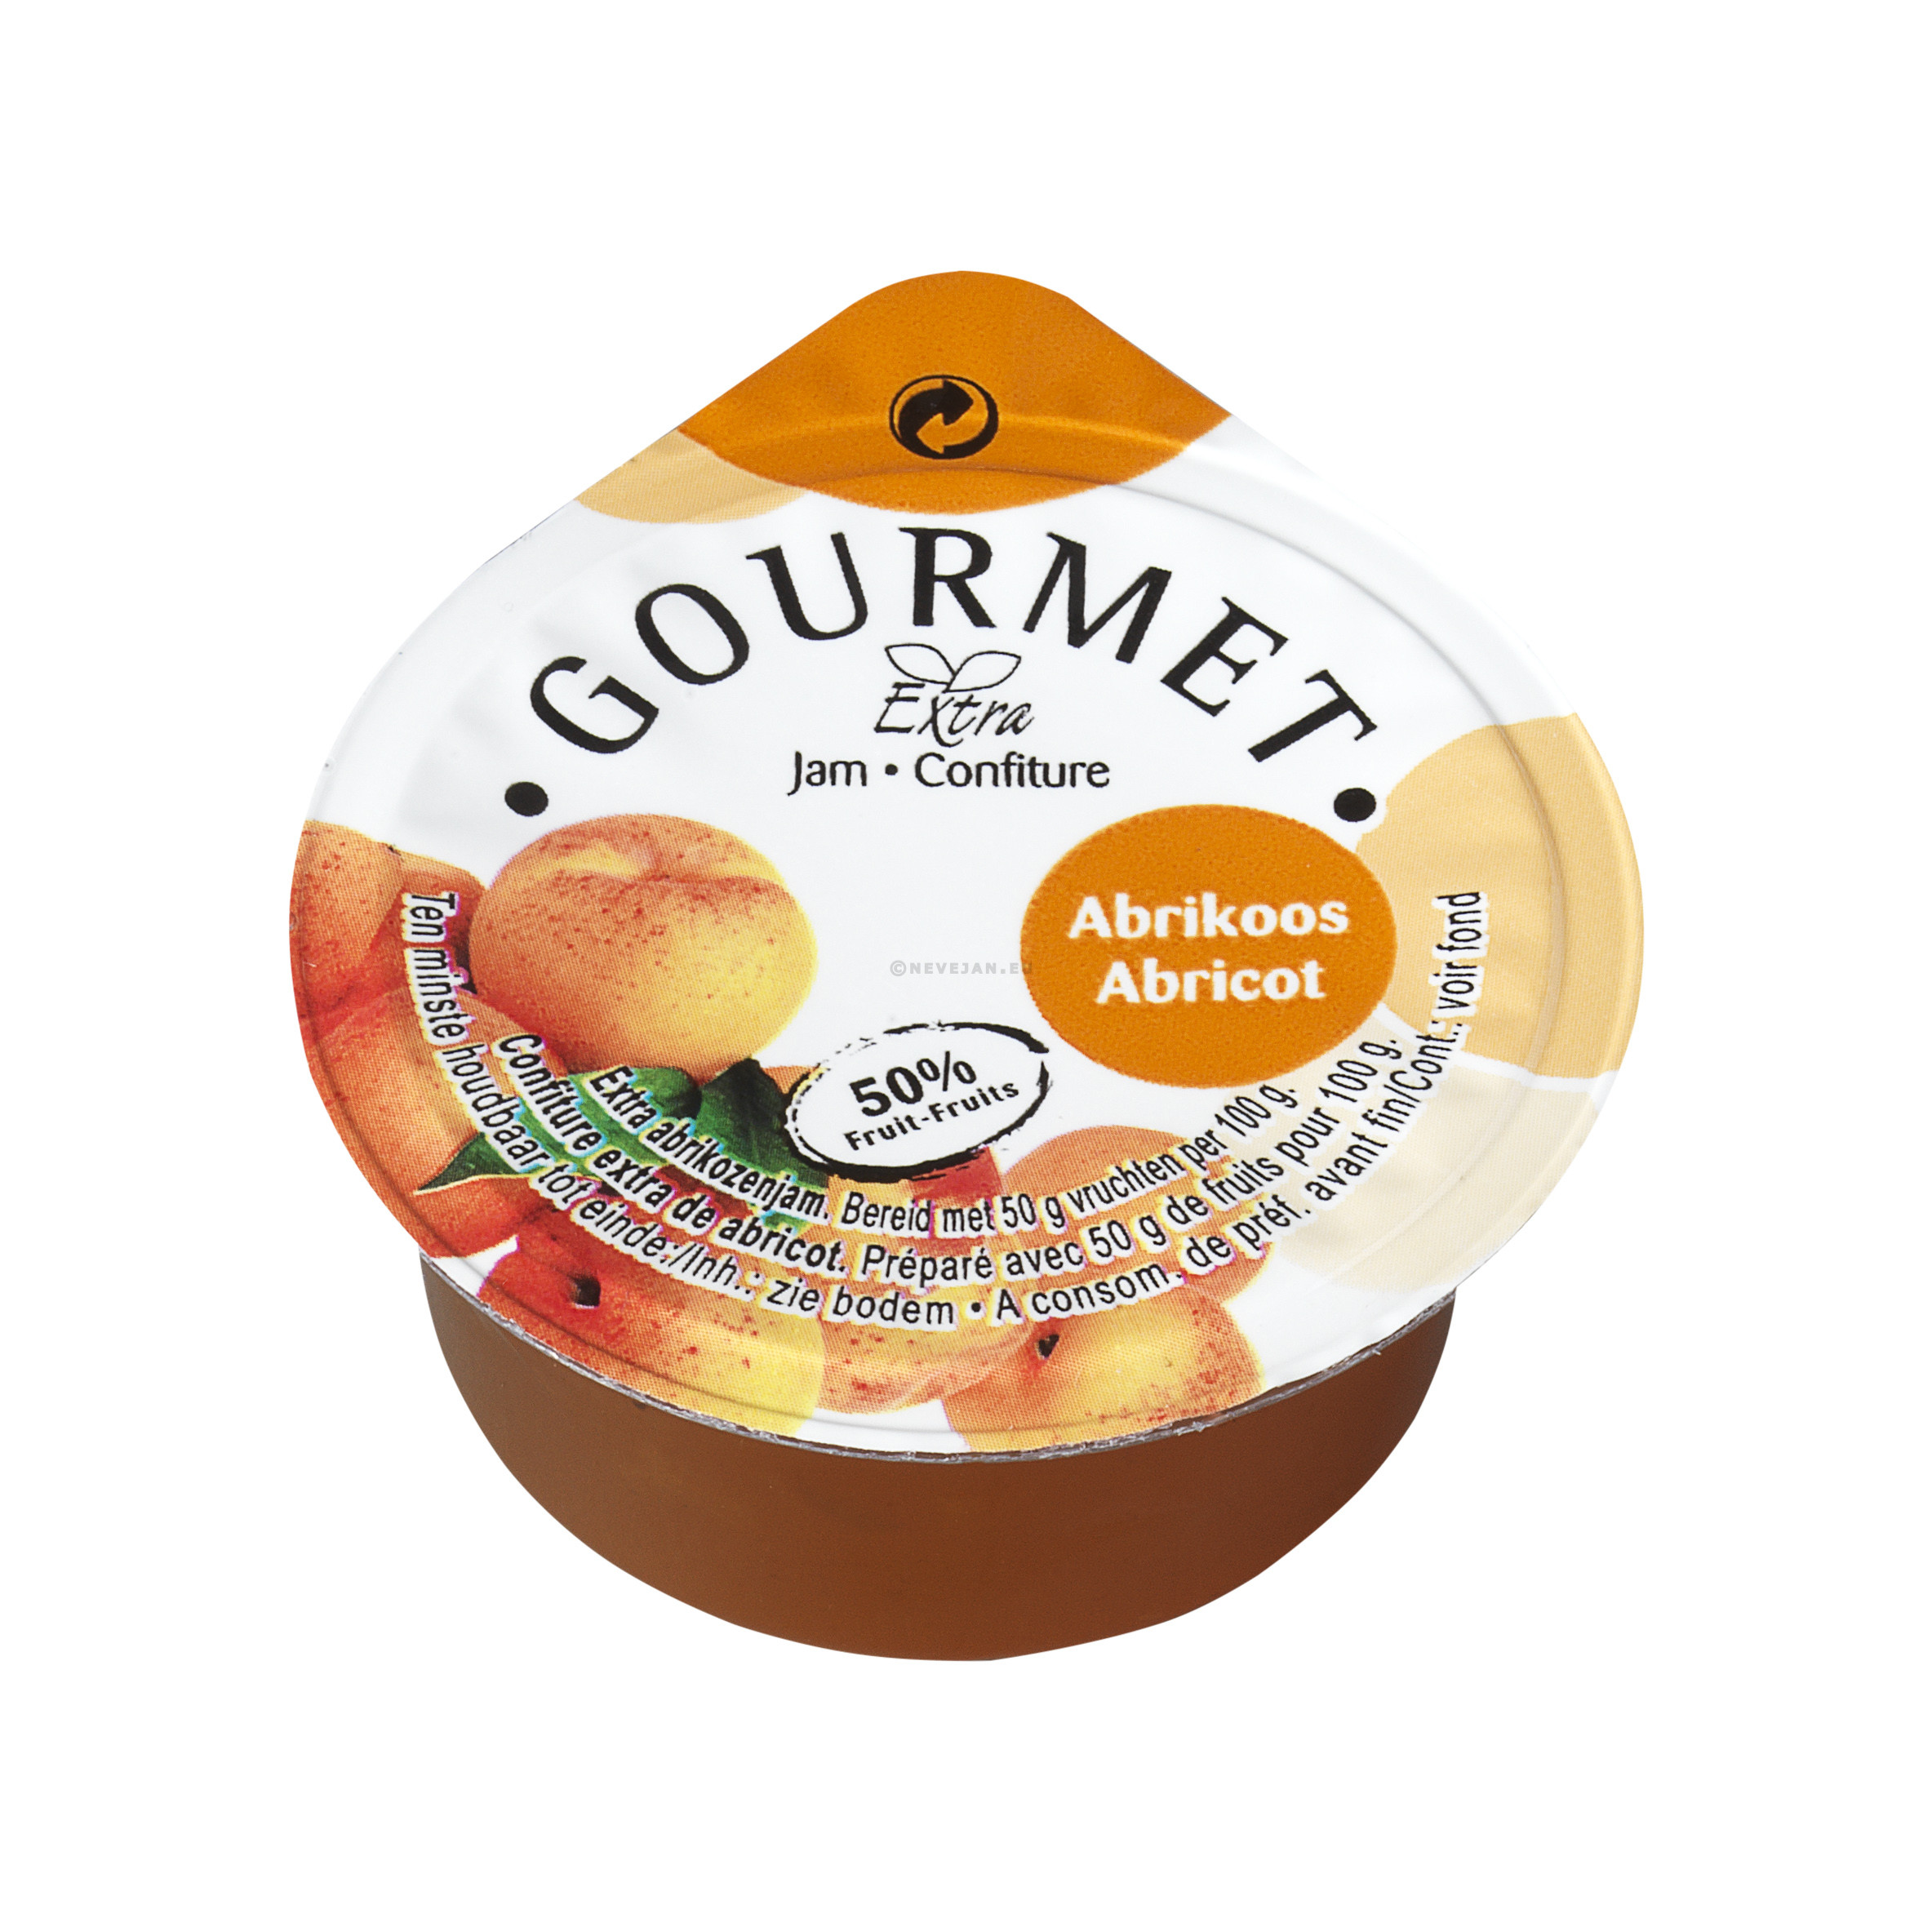 Confituur Porties abrikozen 50%fruit cups 25gr Gourmet